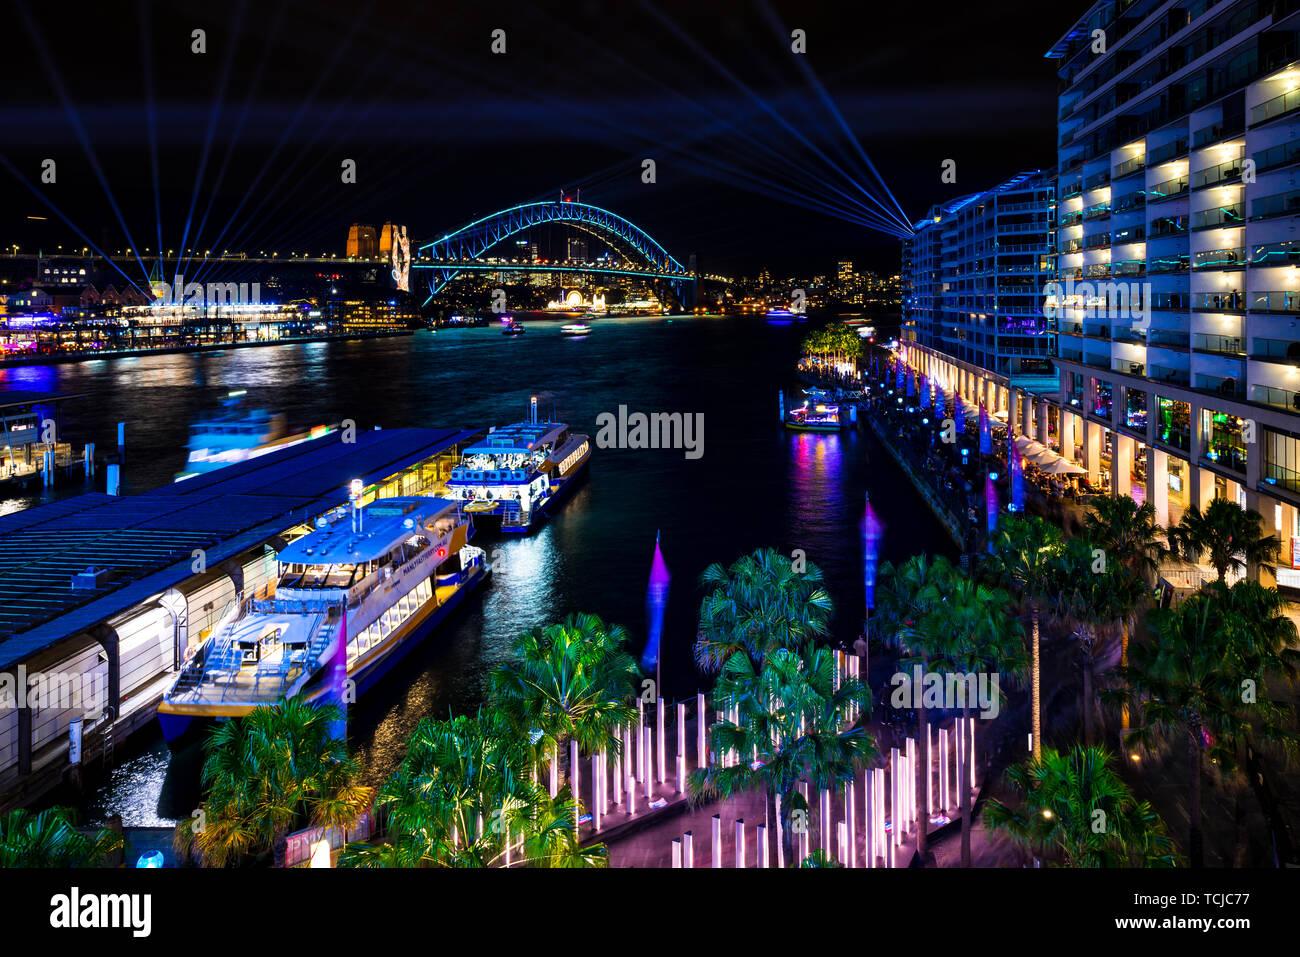 Circular Quay and theSydney Harbour Bridge during Vivid, in Sydney, Australia. Stock Photo